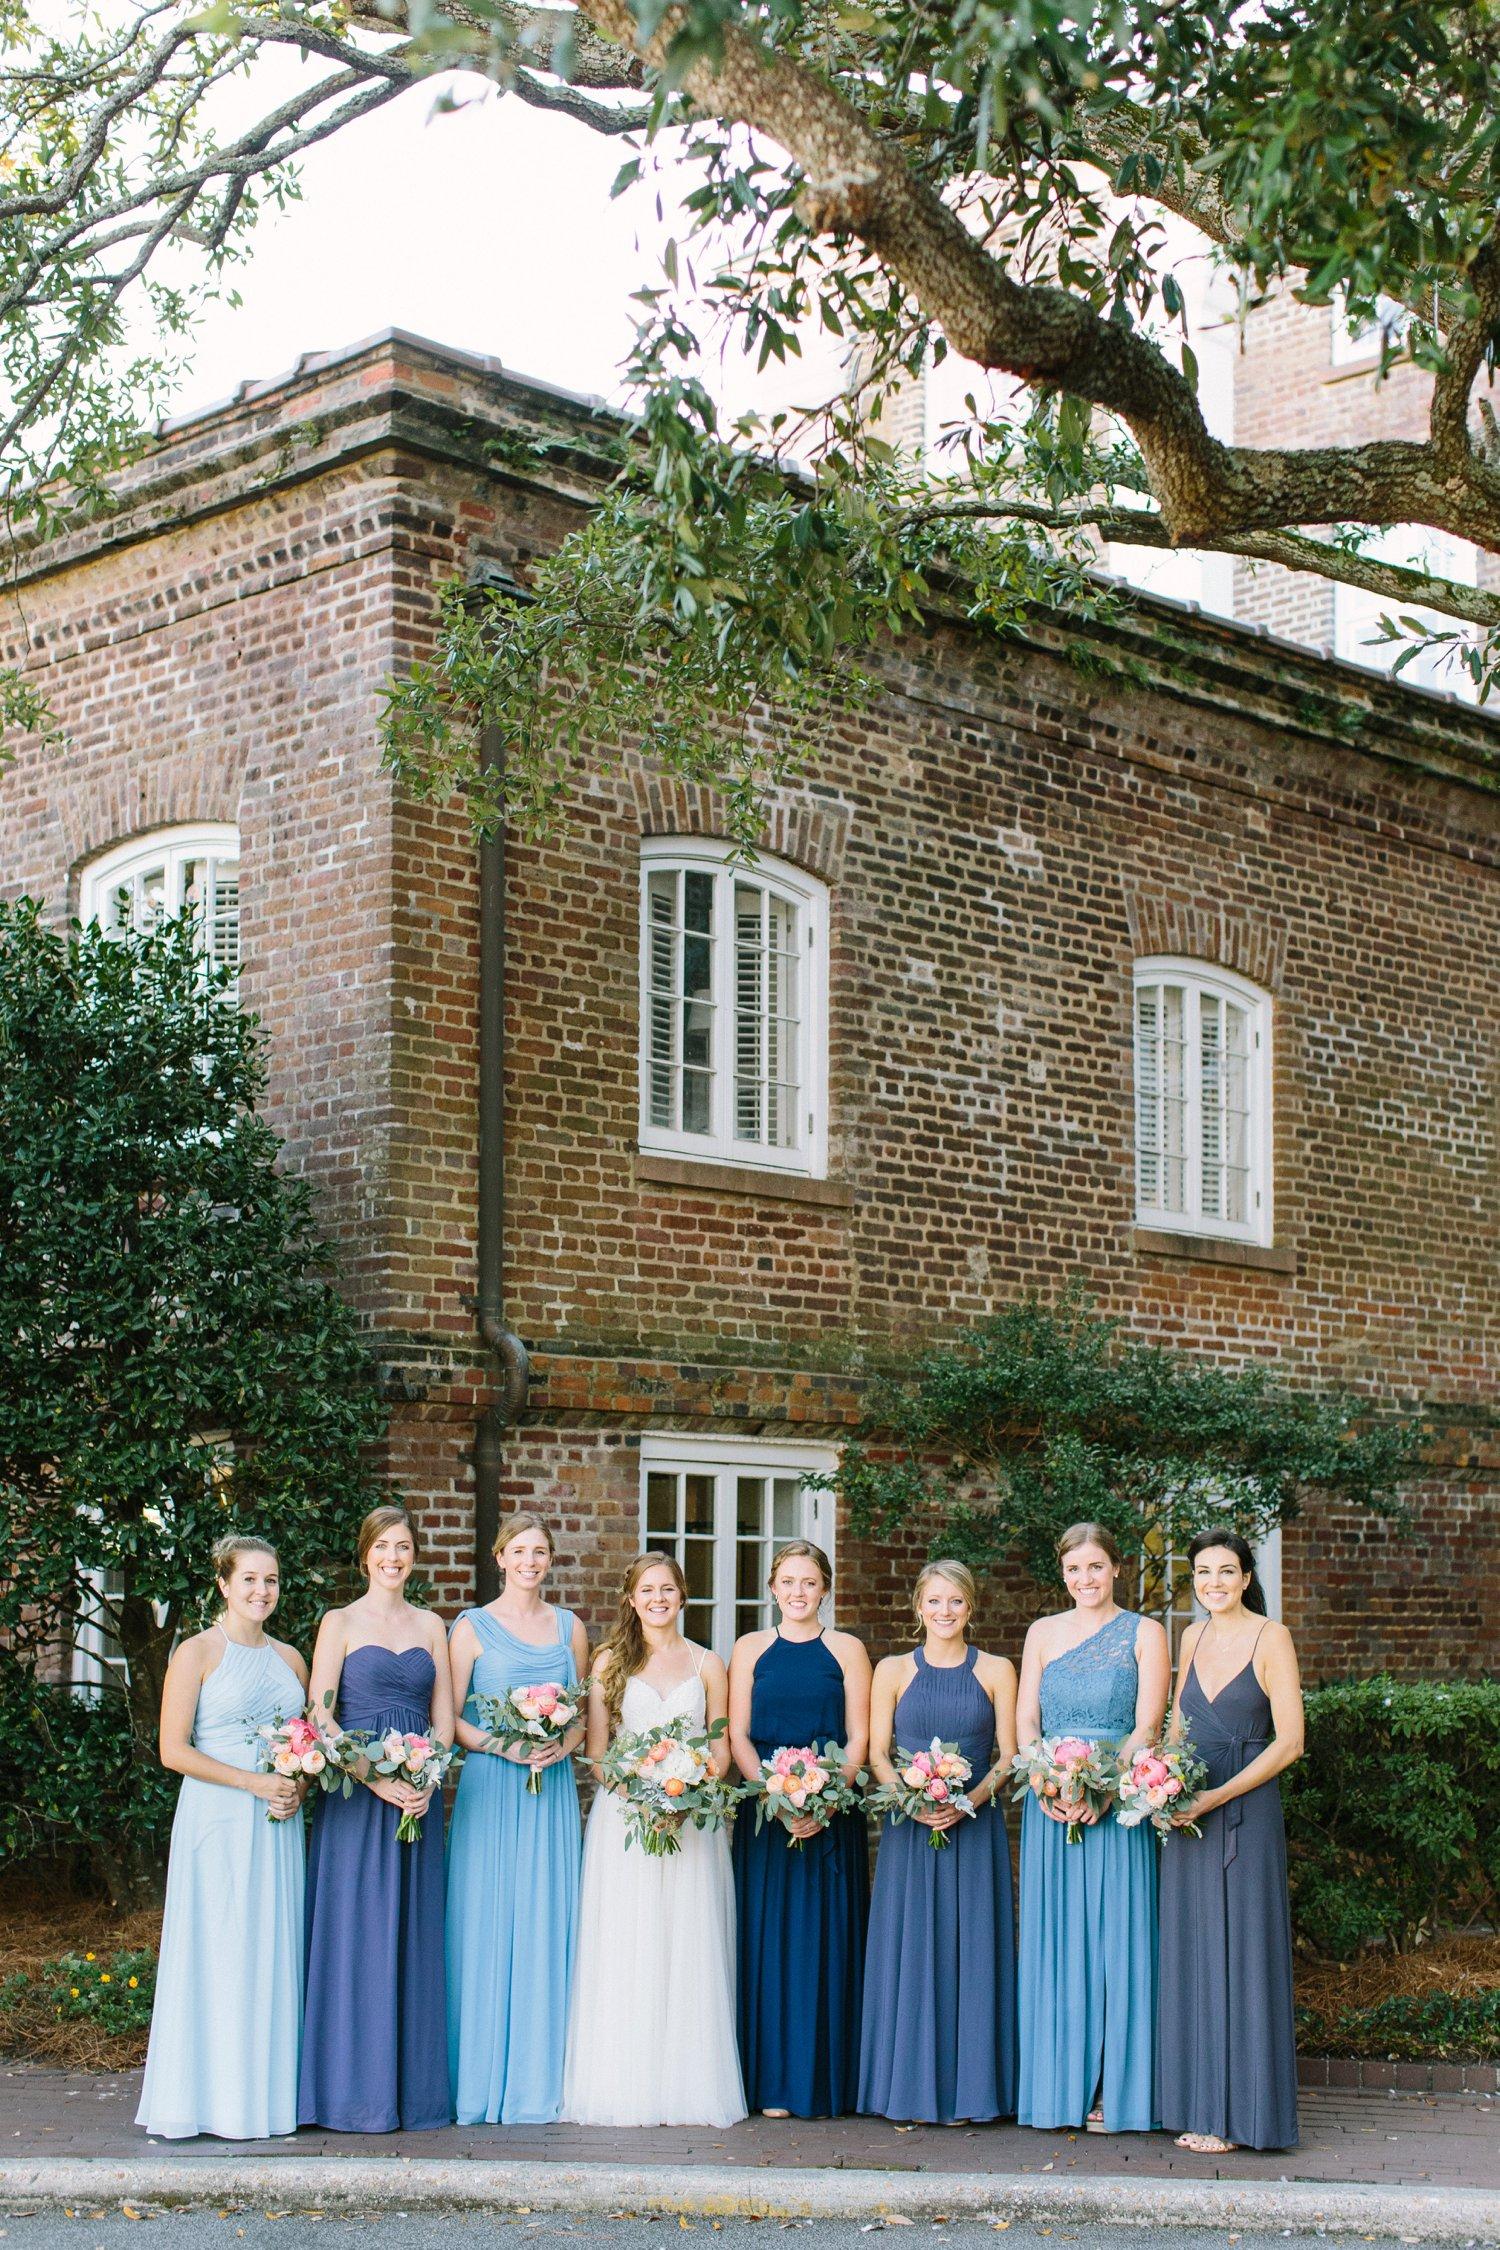 lindsey_a_miller_photography_historic_rice_mill_charleston_wedding_24.jpg